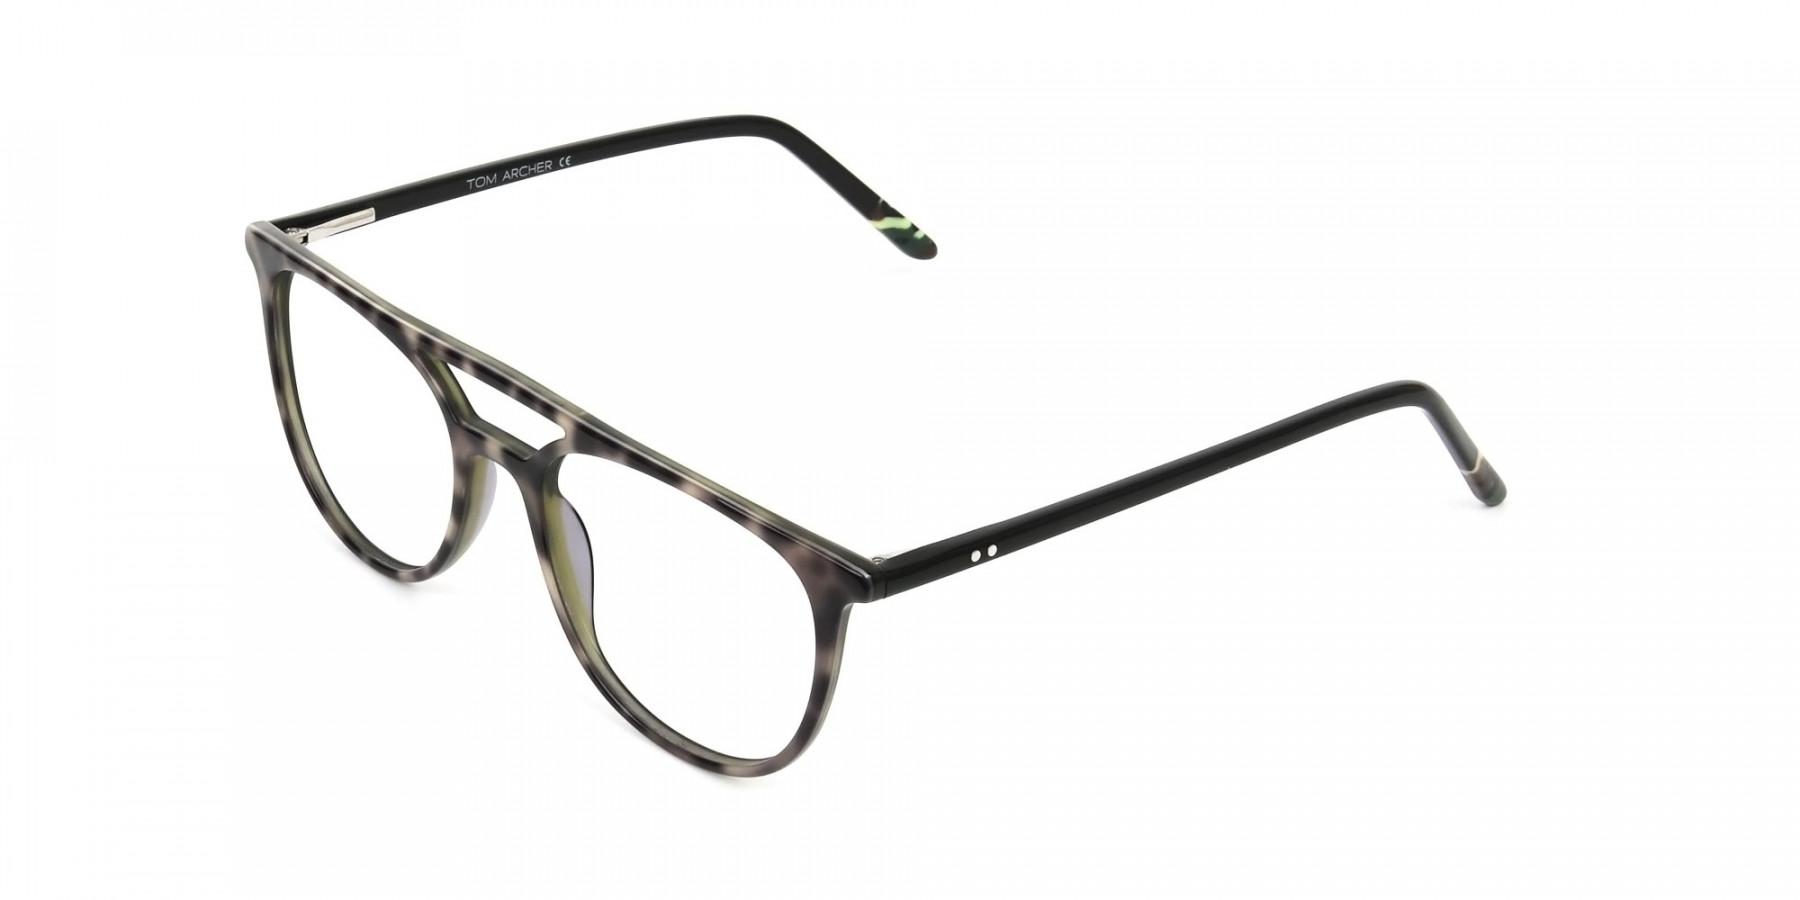 Jungle Green & Grey Tortoise Aviator Spectacles - 1